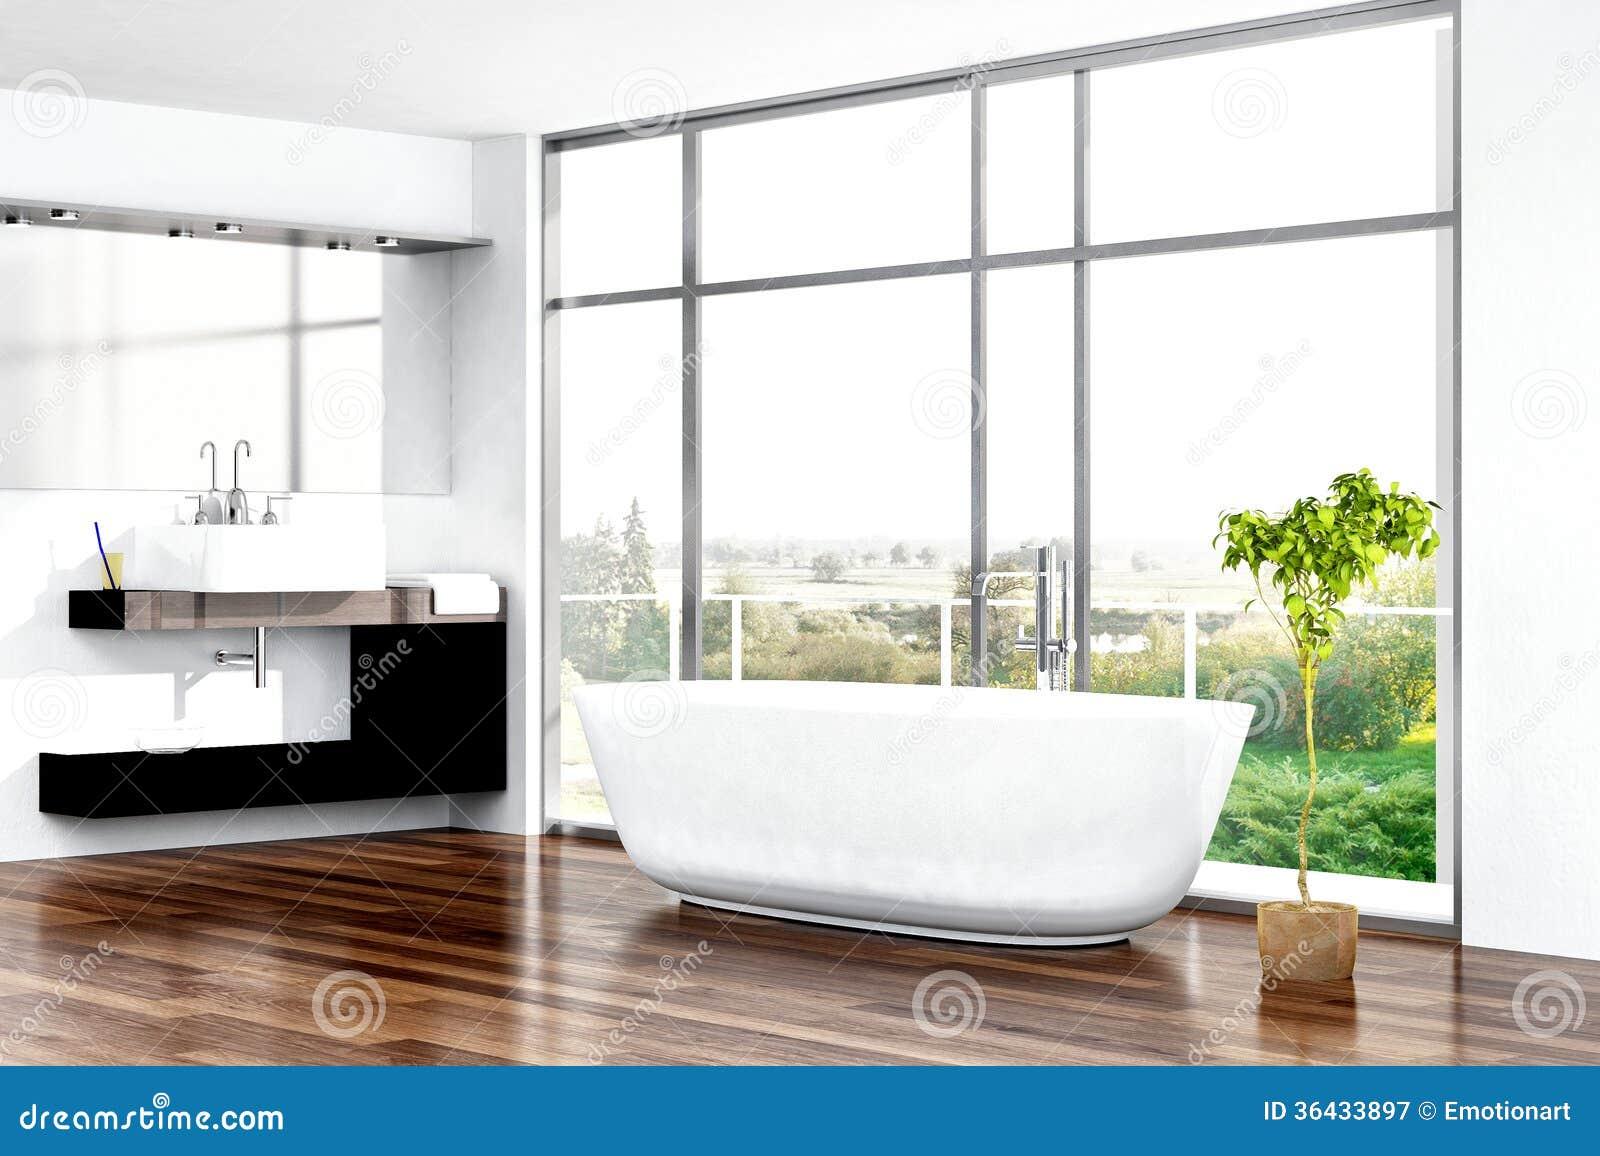 Interieur salle de bain moderne fashion designs for Interieur salle de bain